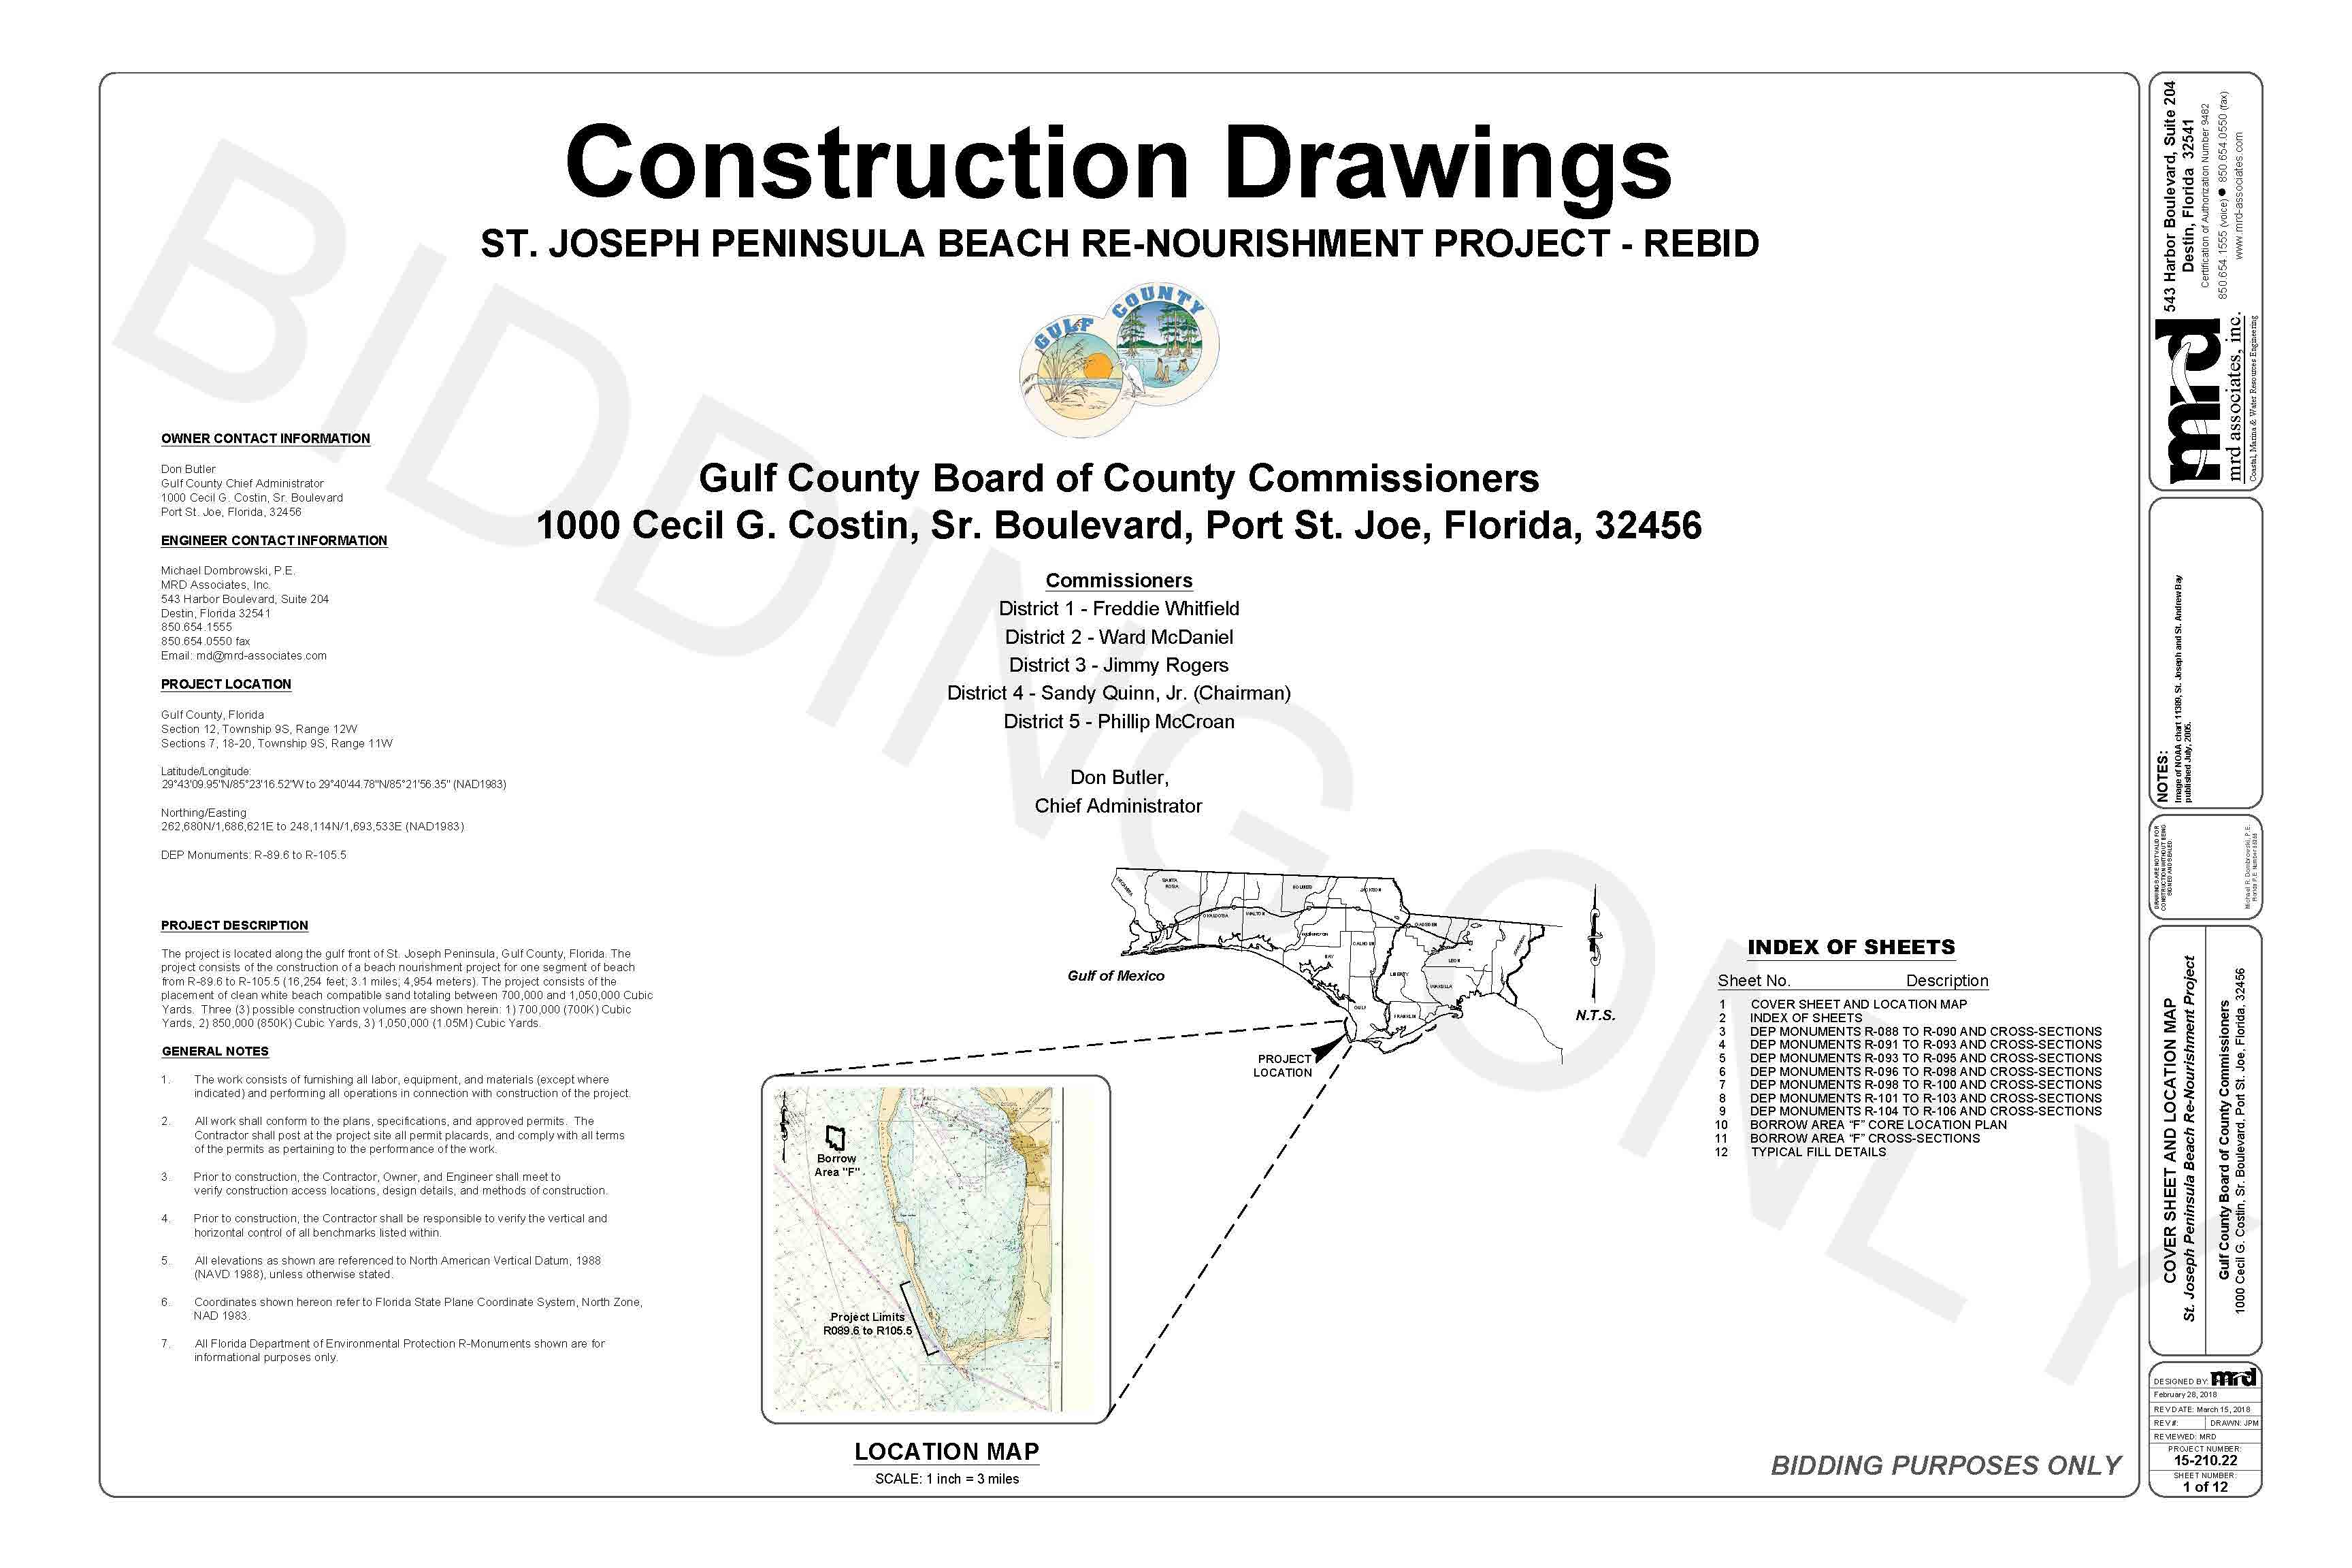 SJP Beach Renourishment Project